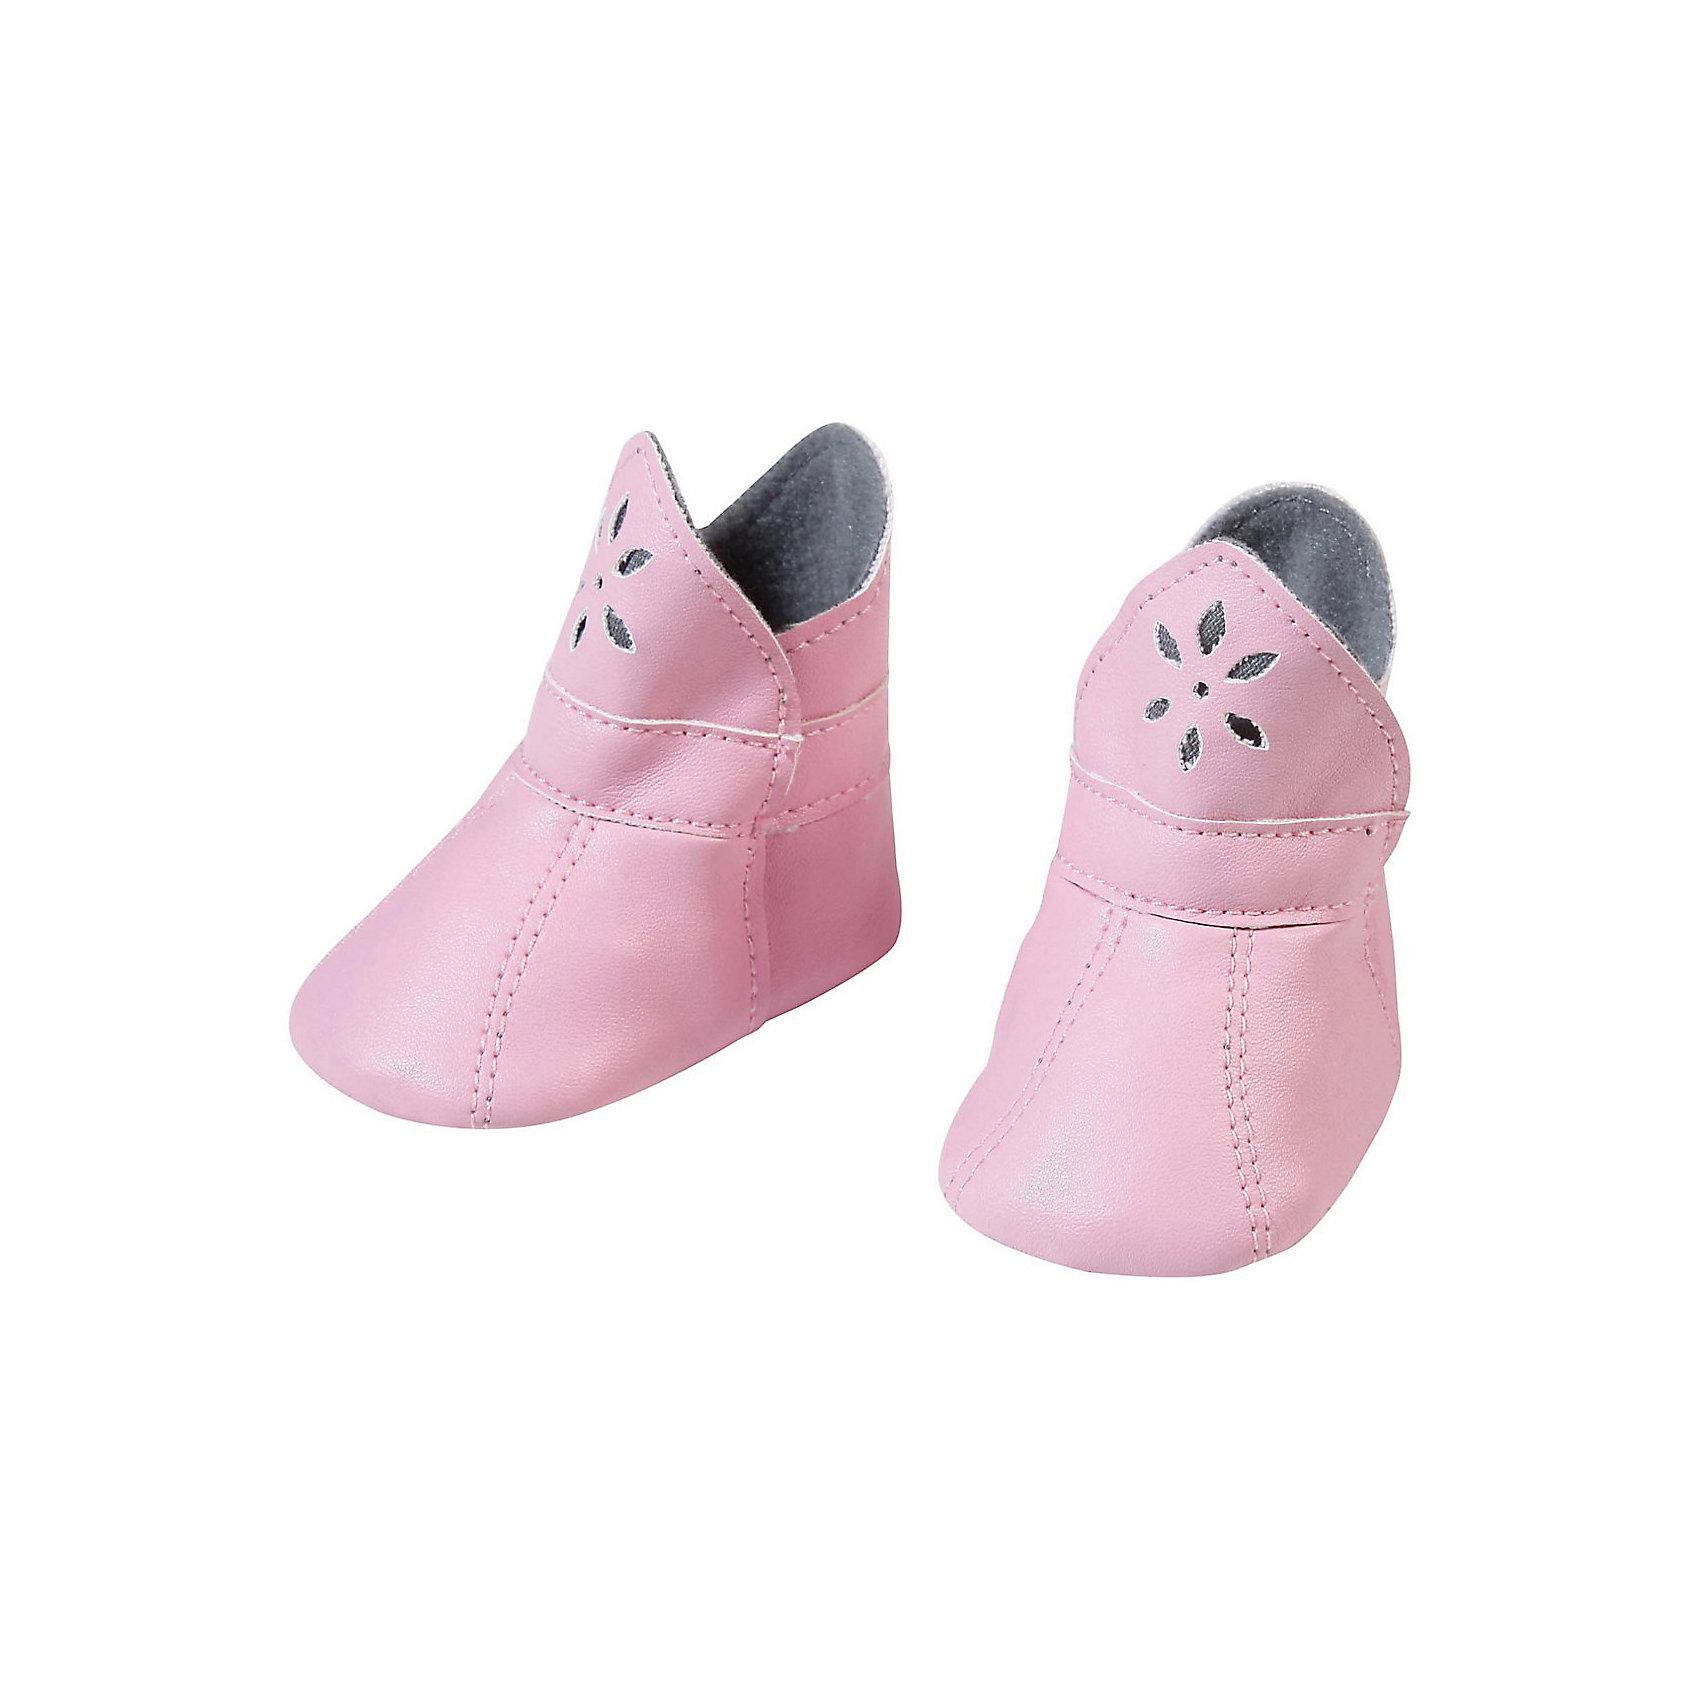 Ботиночки, розовые, Baby Annabell